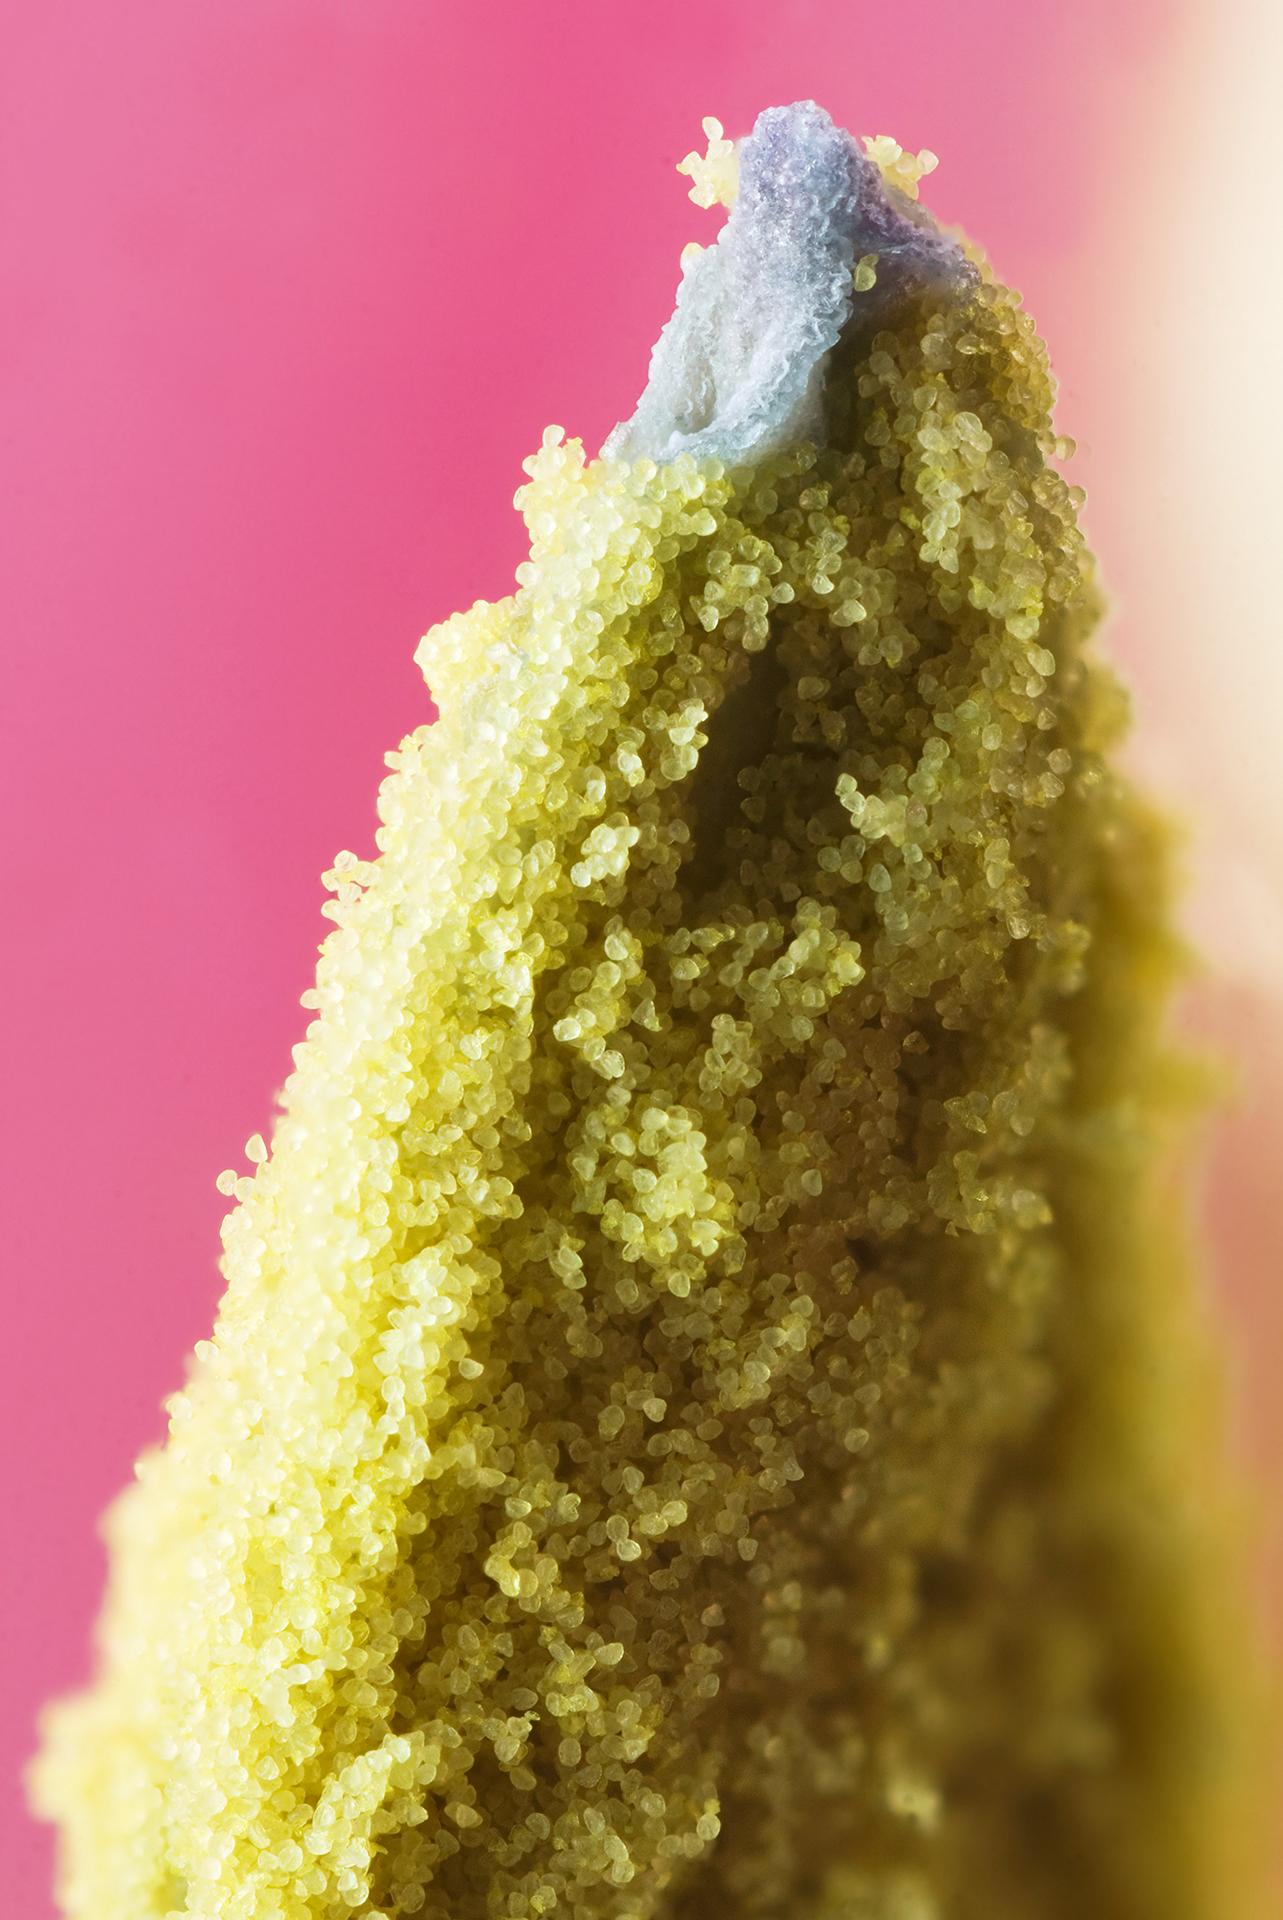 Pollen - Wikipedia